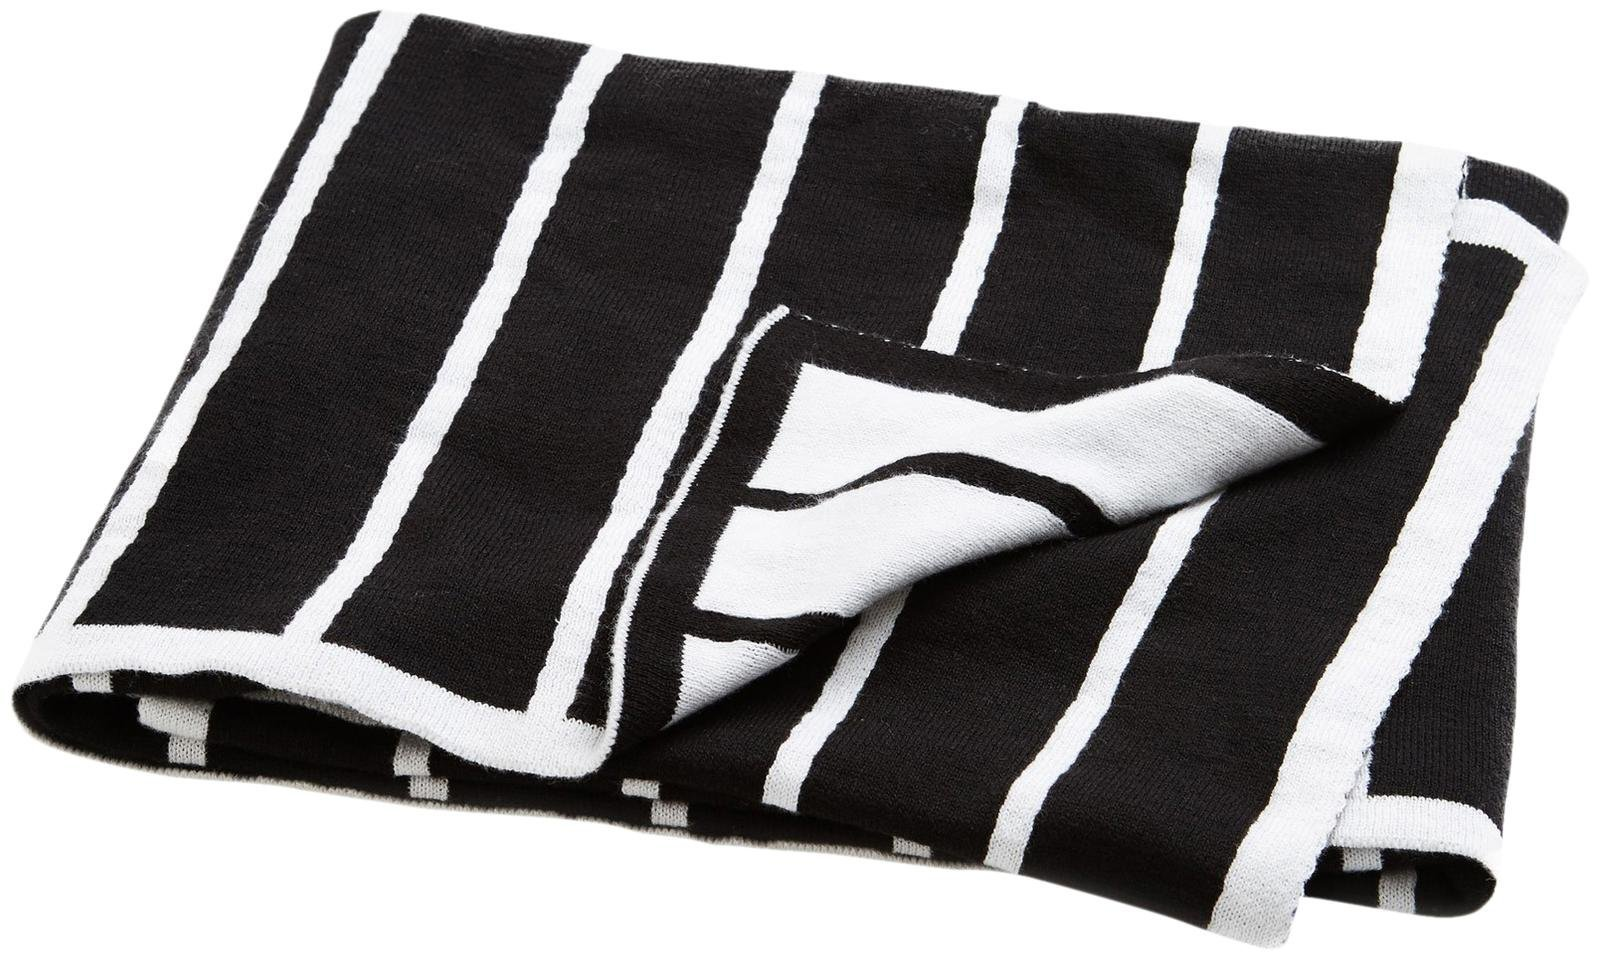 Brooklyn Born Organic Knitted Blanket - Breton Stripe, Black/White, One Size